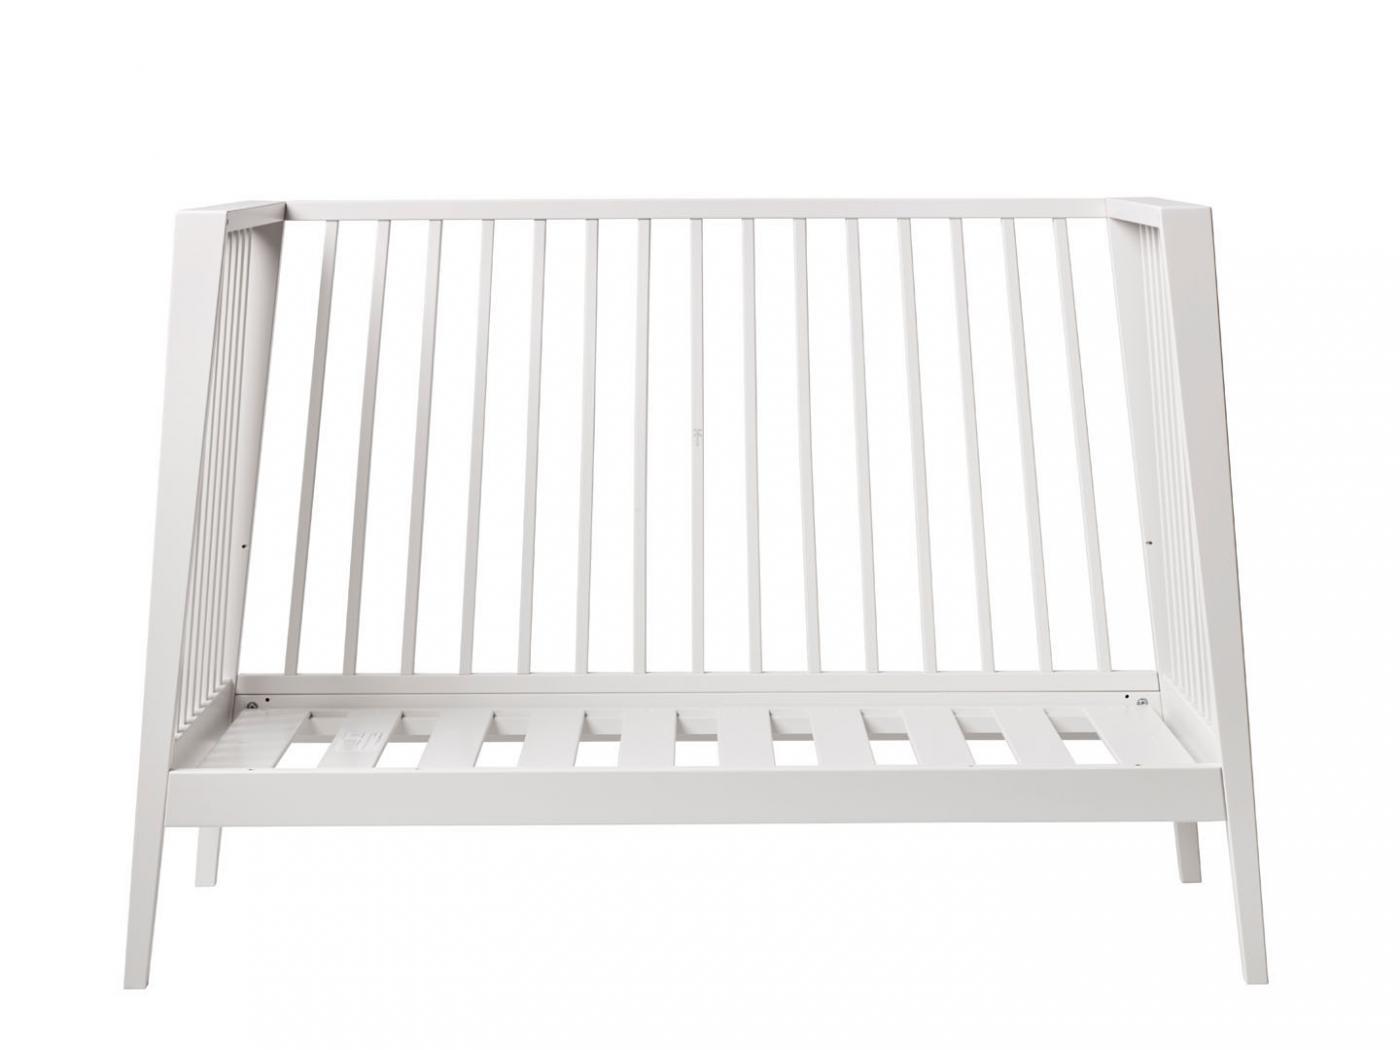 leander lit b b linea en h tre blanc sans matelas. Black Bedroom Furniture Sets. Home Design Ideas